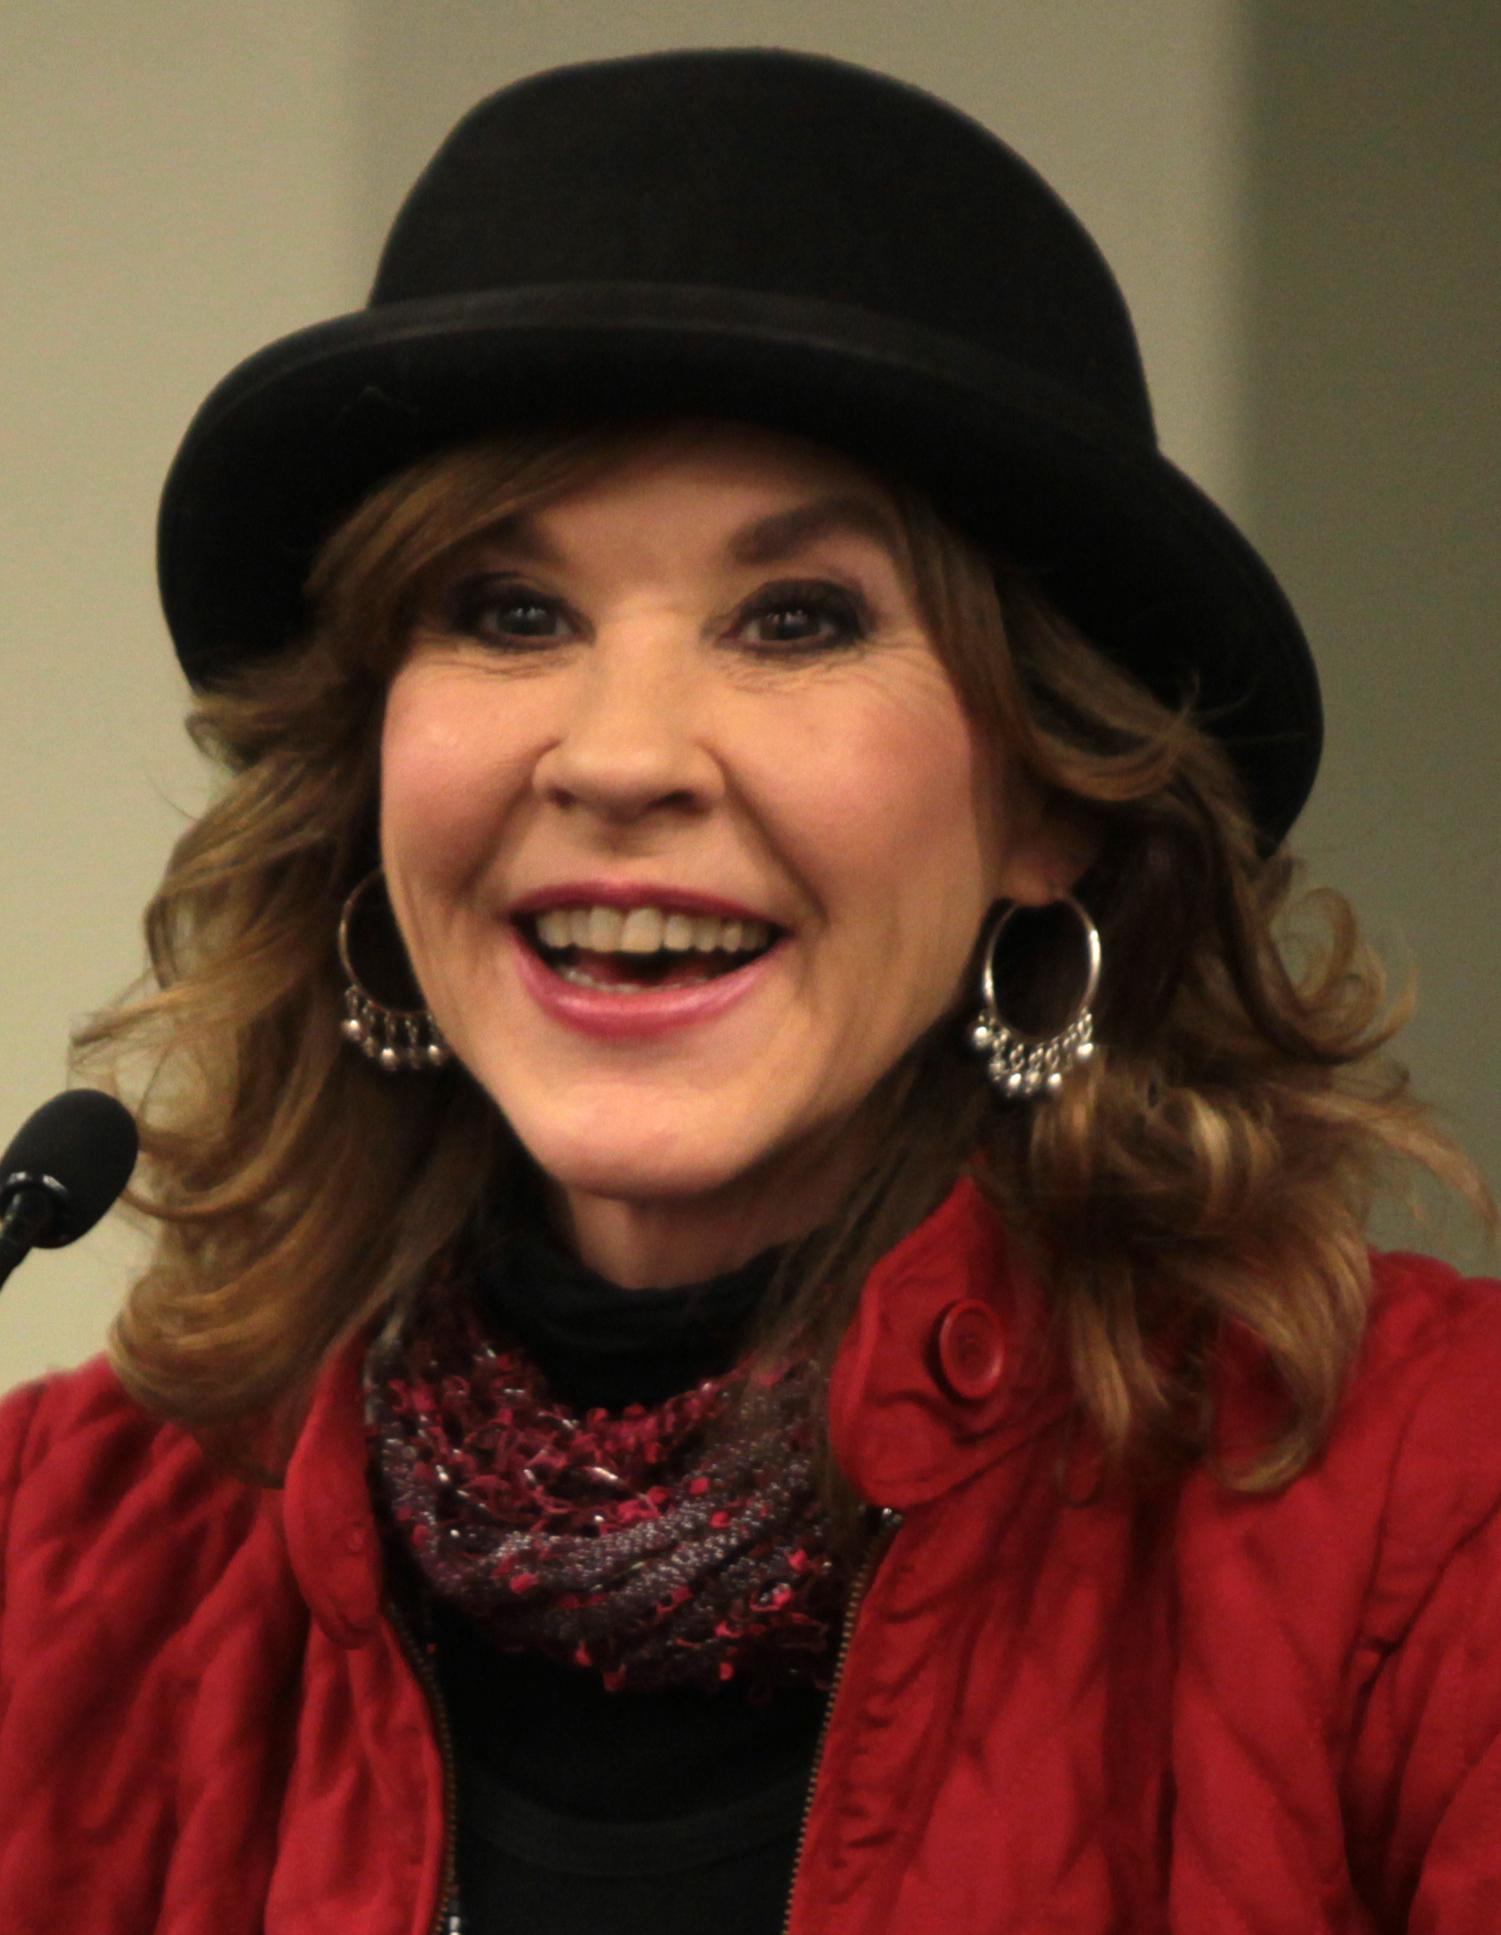 Linda Blair appearances